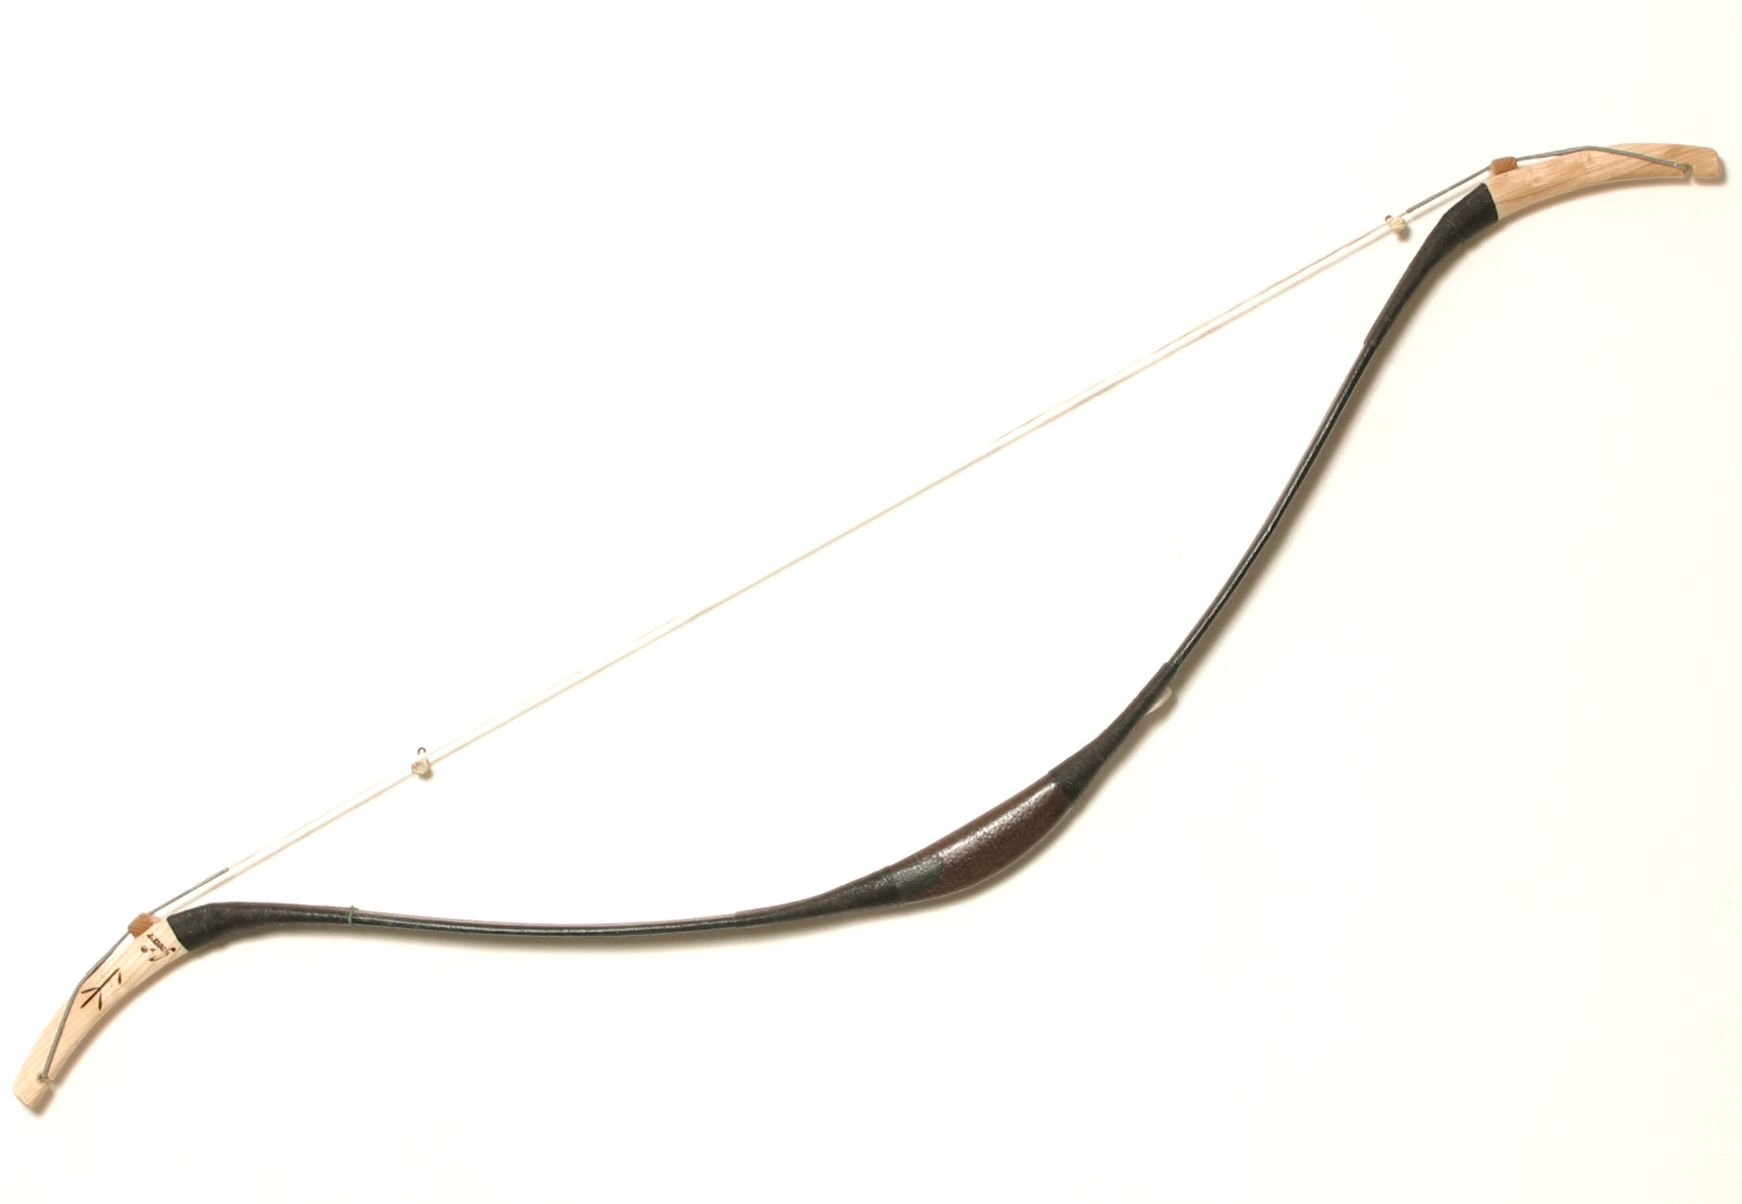 Grozer Assyrian recurve bow